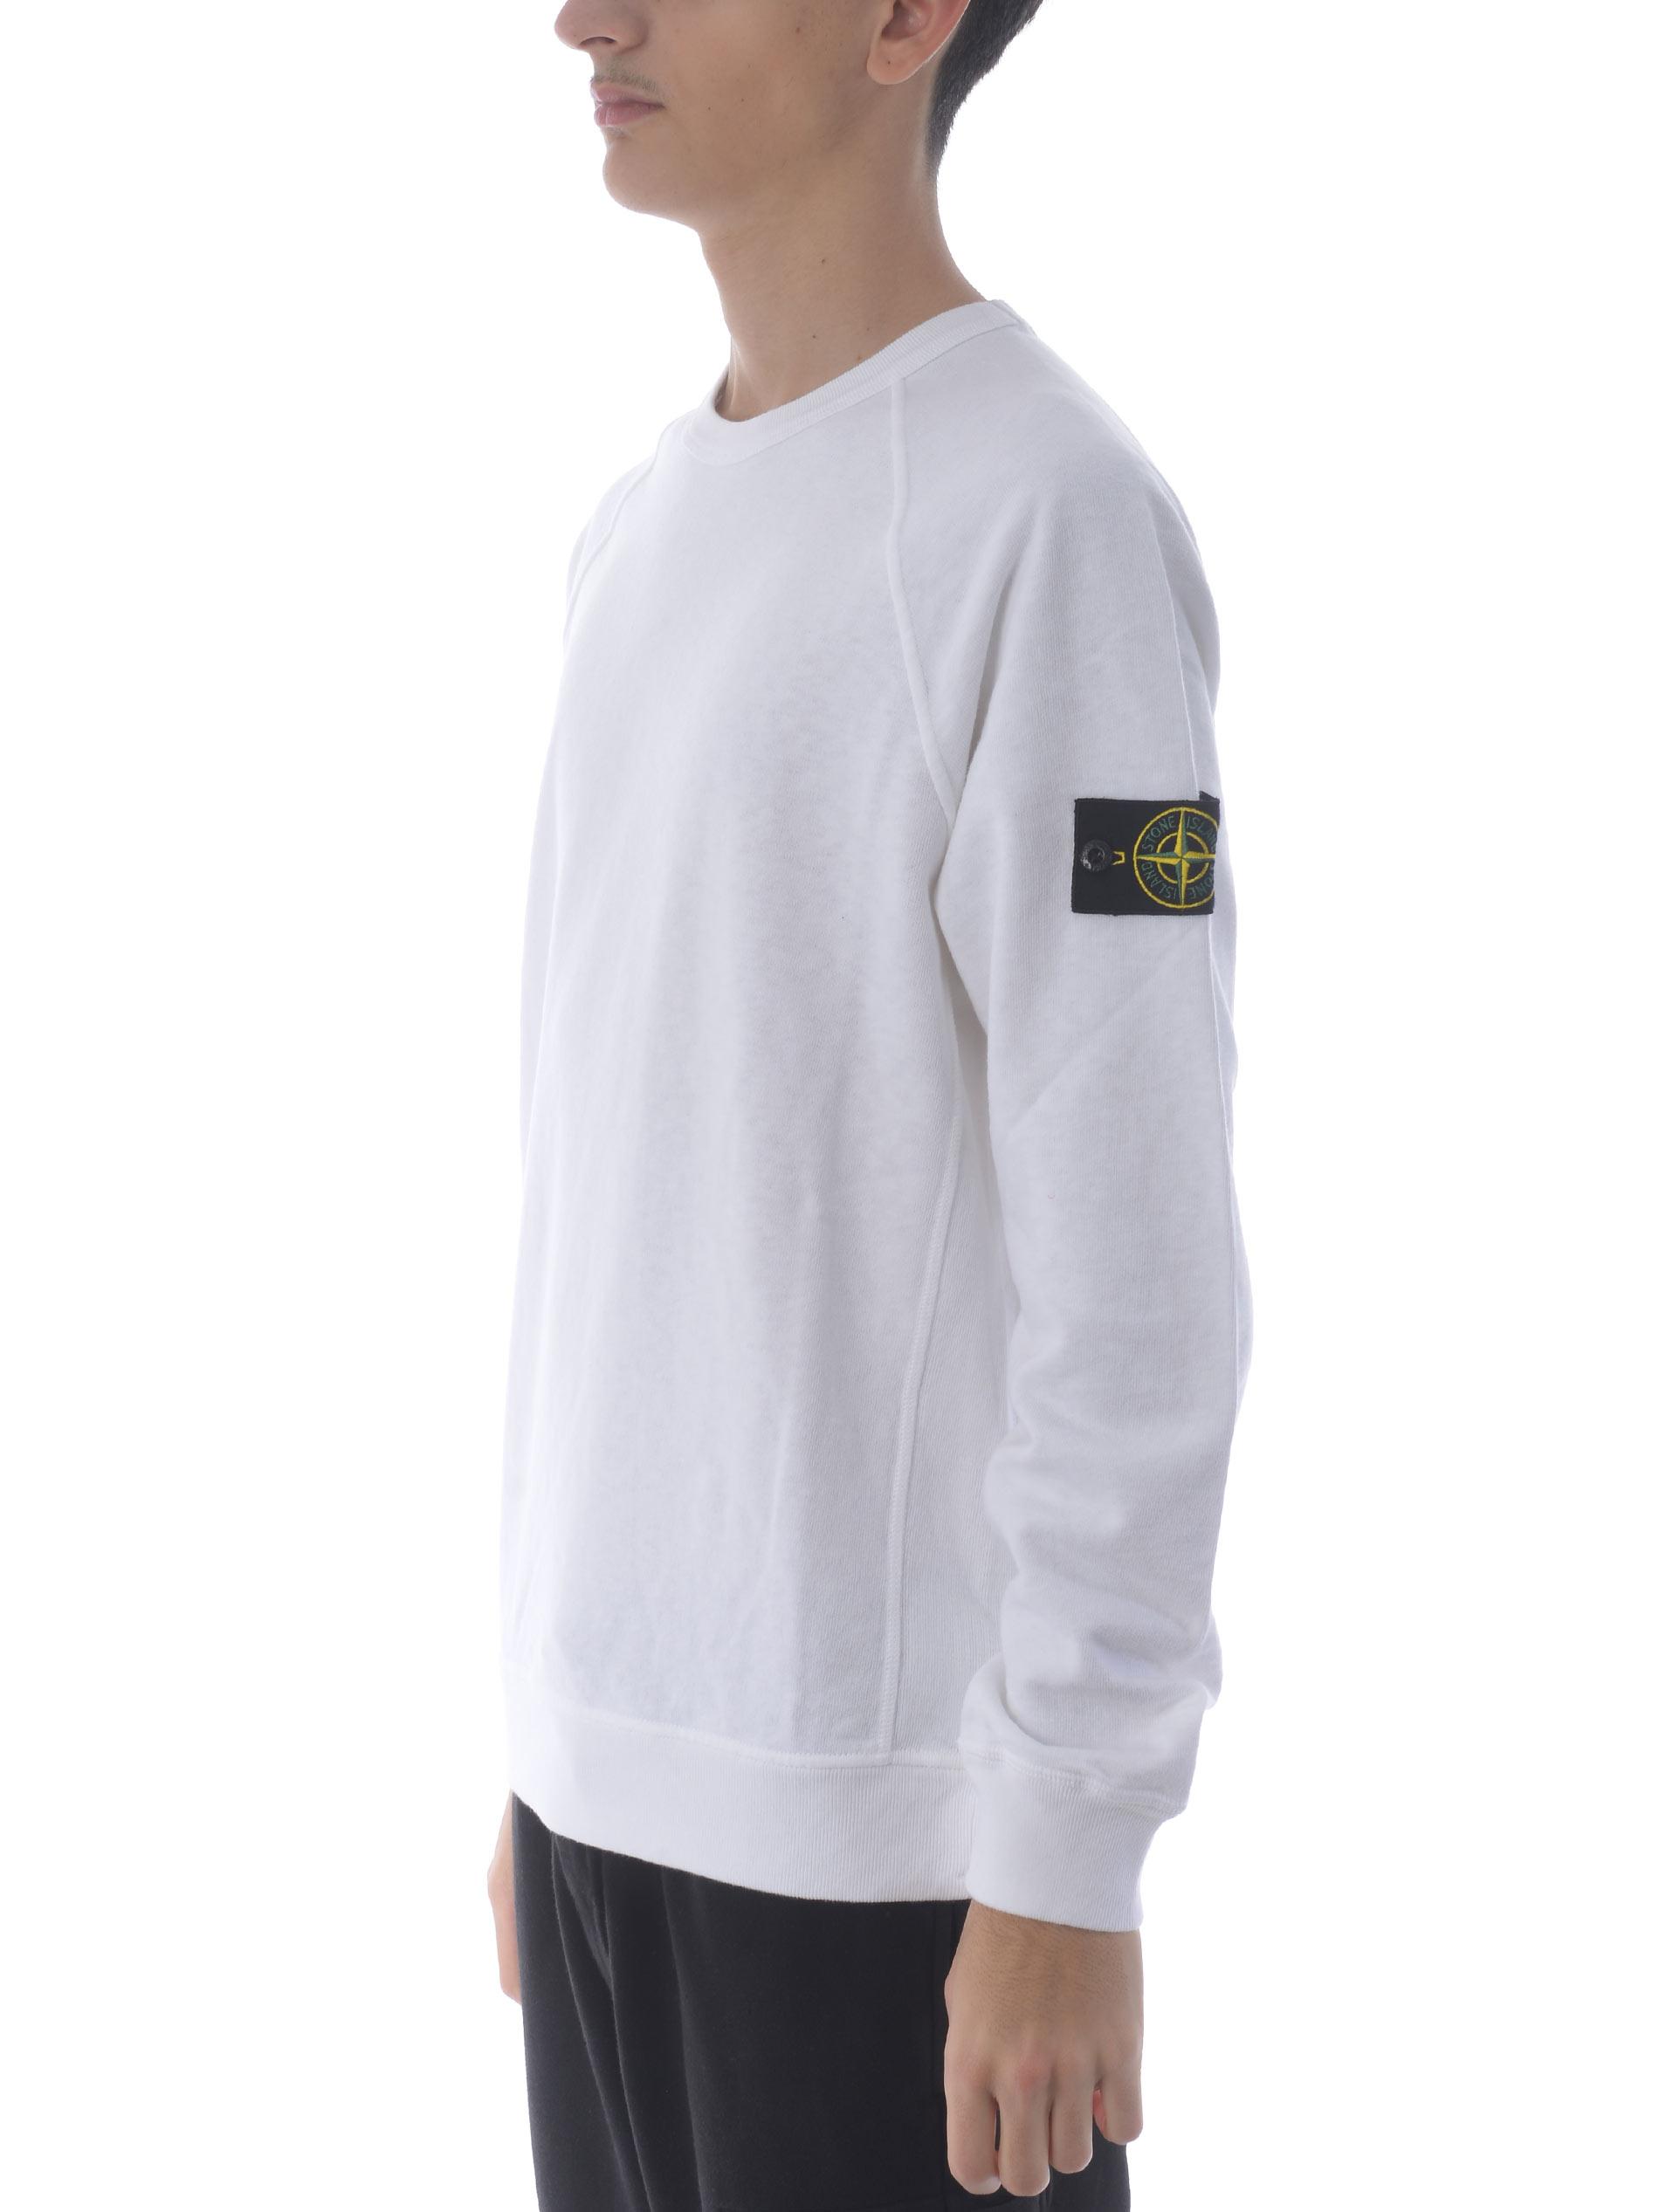 Stone Island cotton sweatshirt STONE ISLAND | 10000005 | 66060V0001